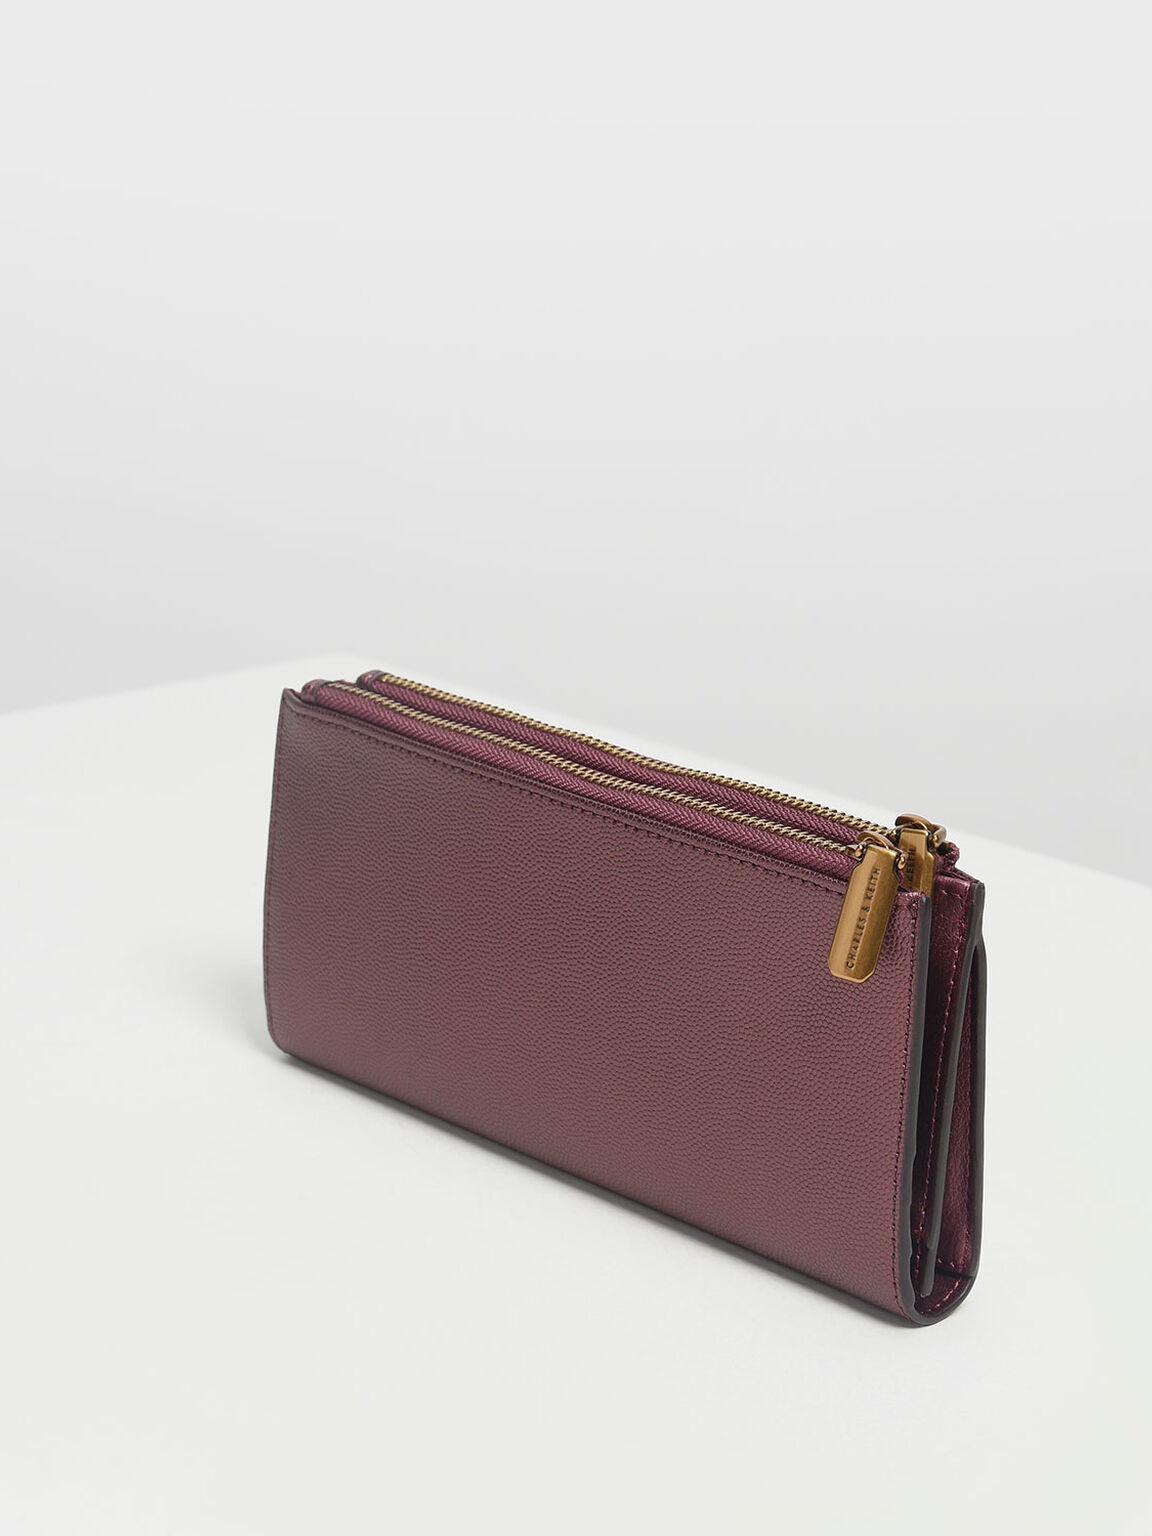 Classic Zipped Wallet, Prune, hi-res